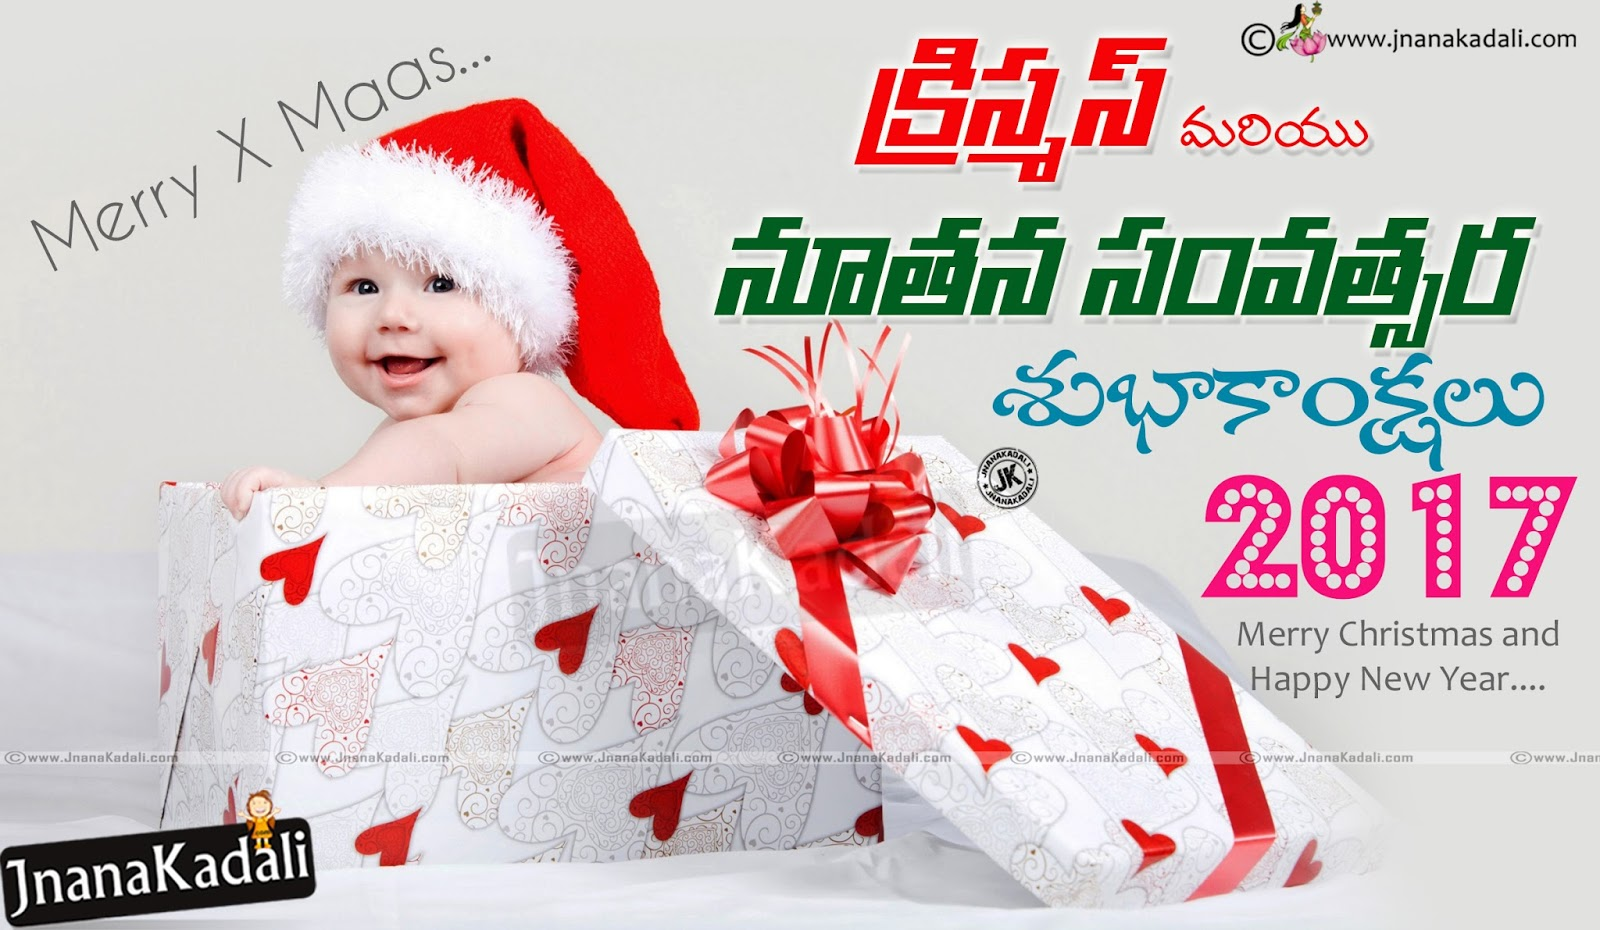 Merry Christmas and Happy New Year 2017 Greetings in Telugu   JNANA KADALI.COM  Telugu Quotes ...